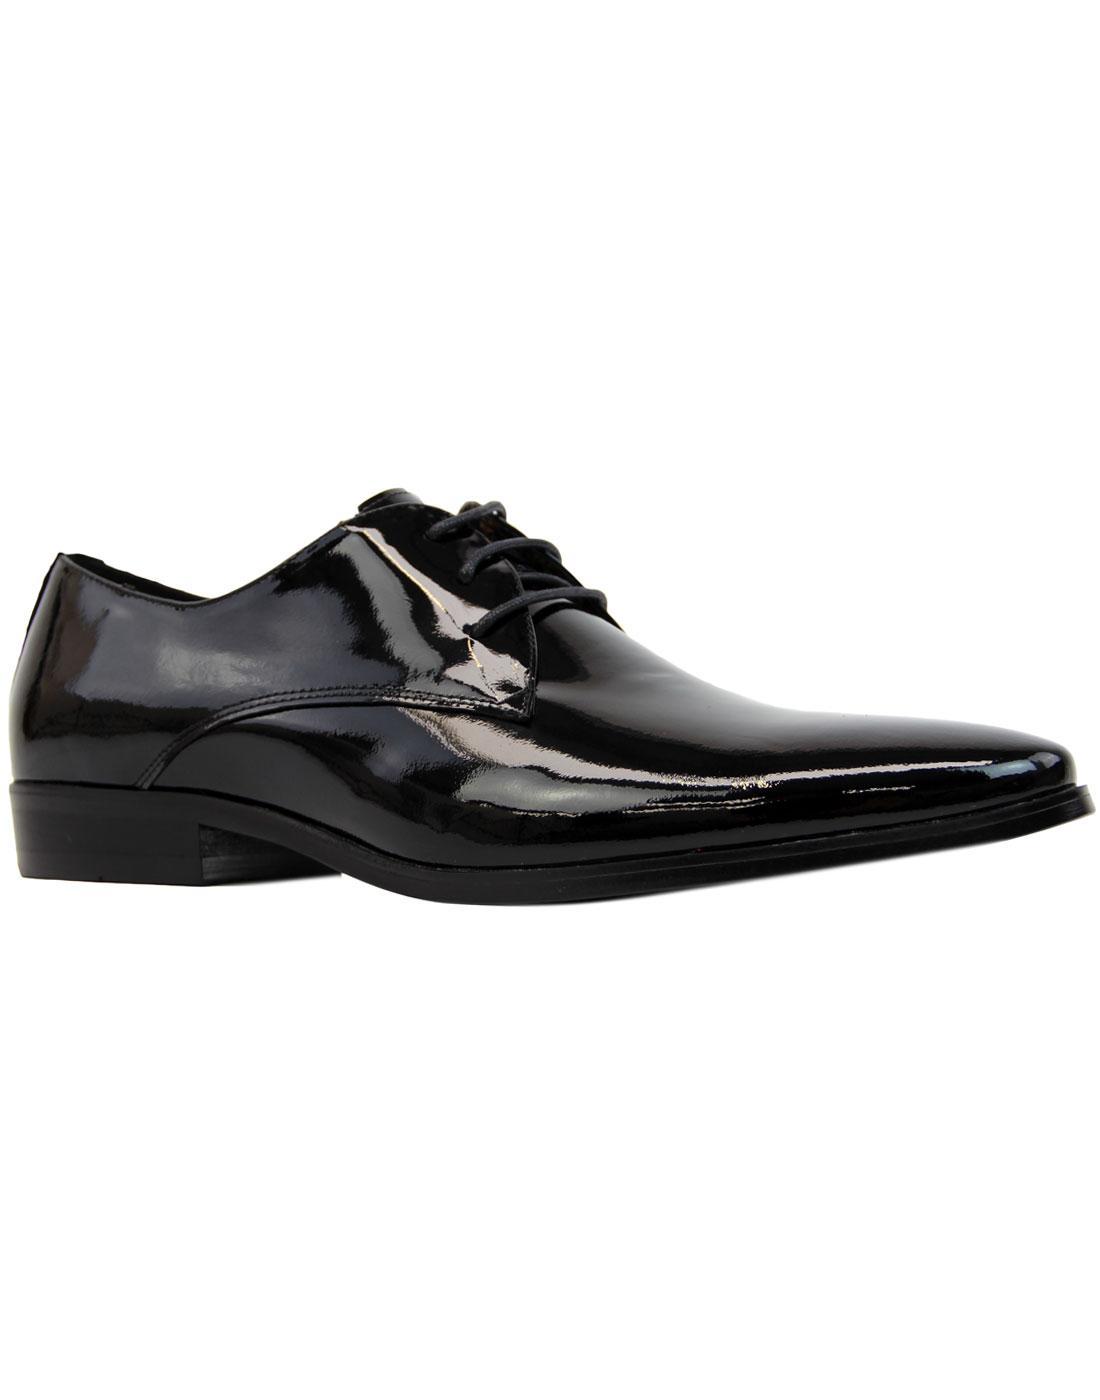 Sai Lace PAOLO VANDINI Patent Leather Dress Shoes